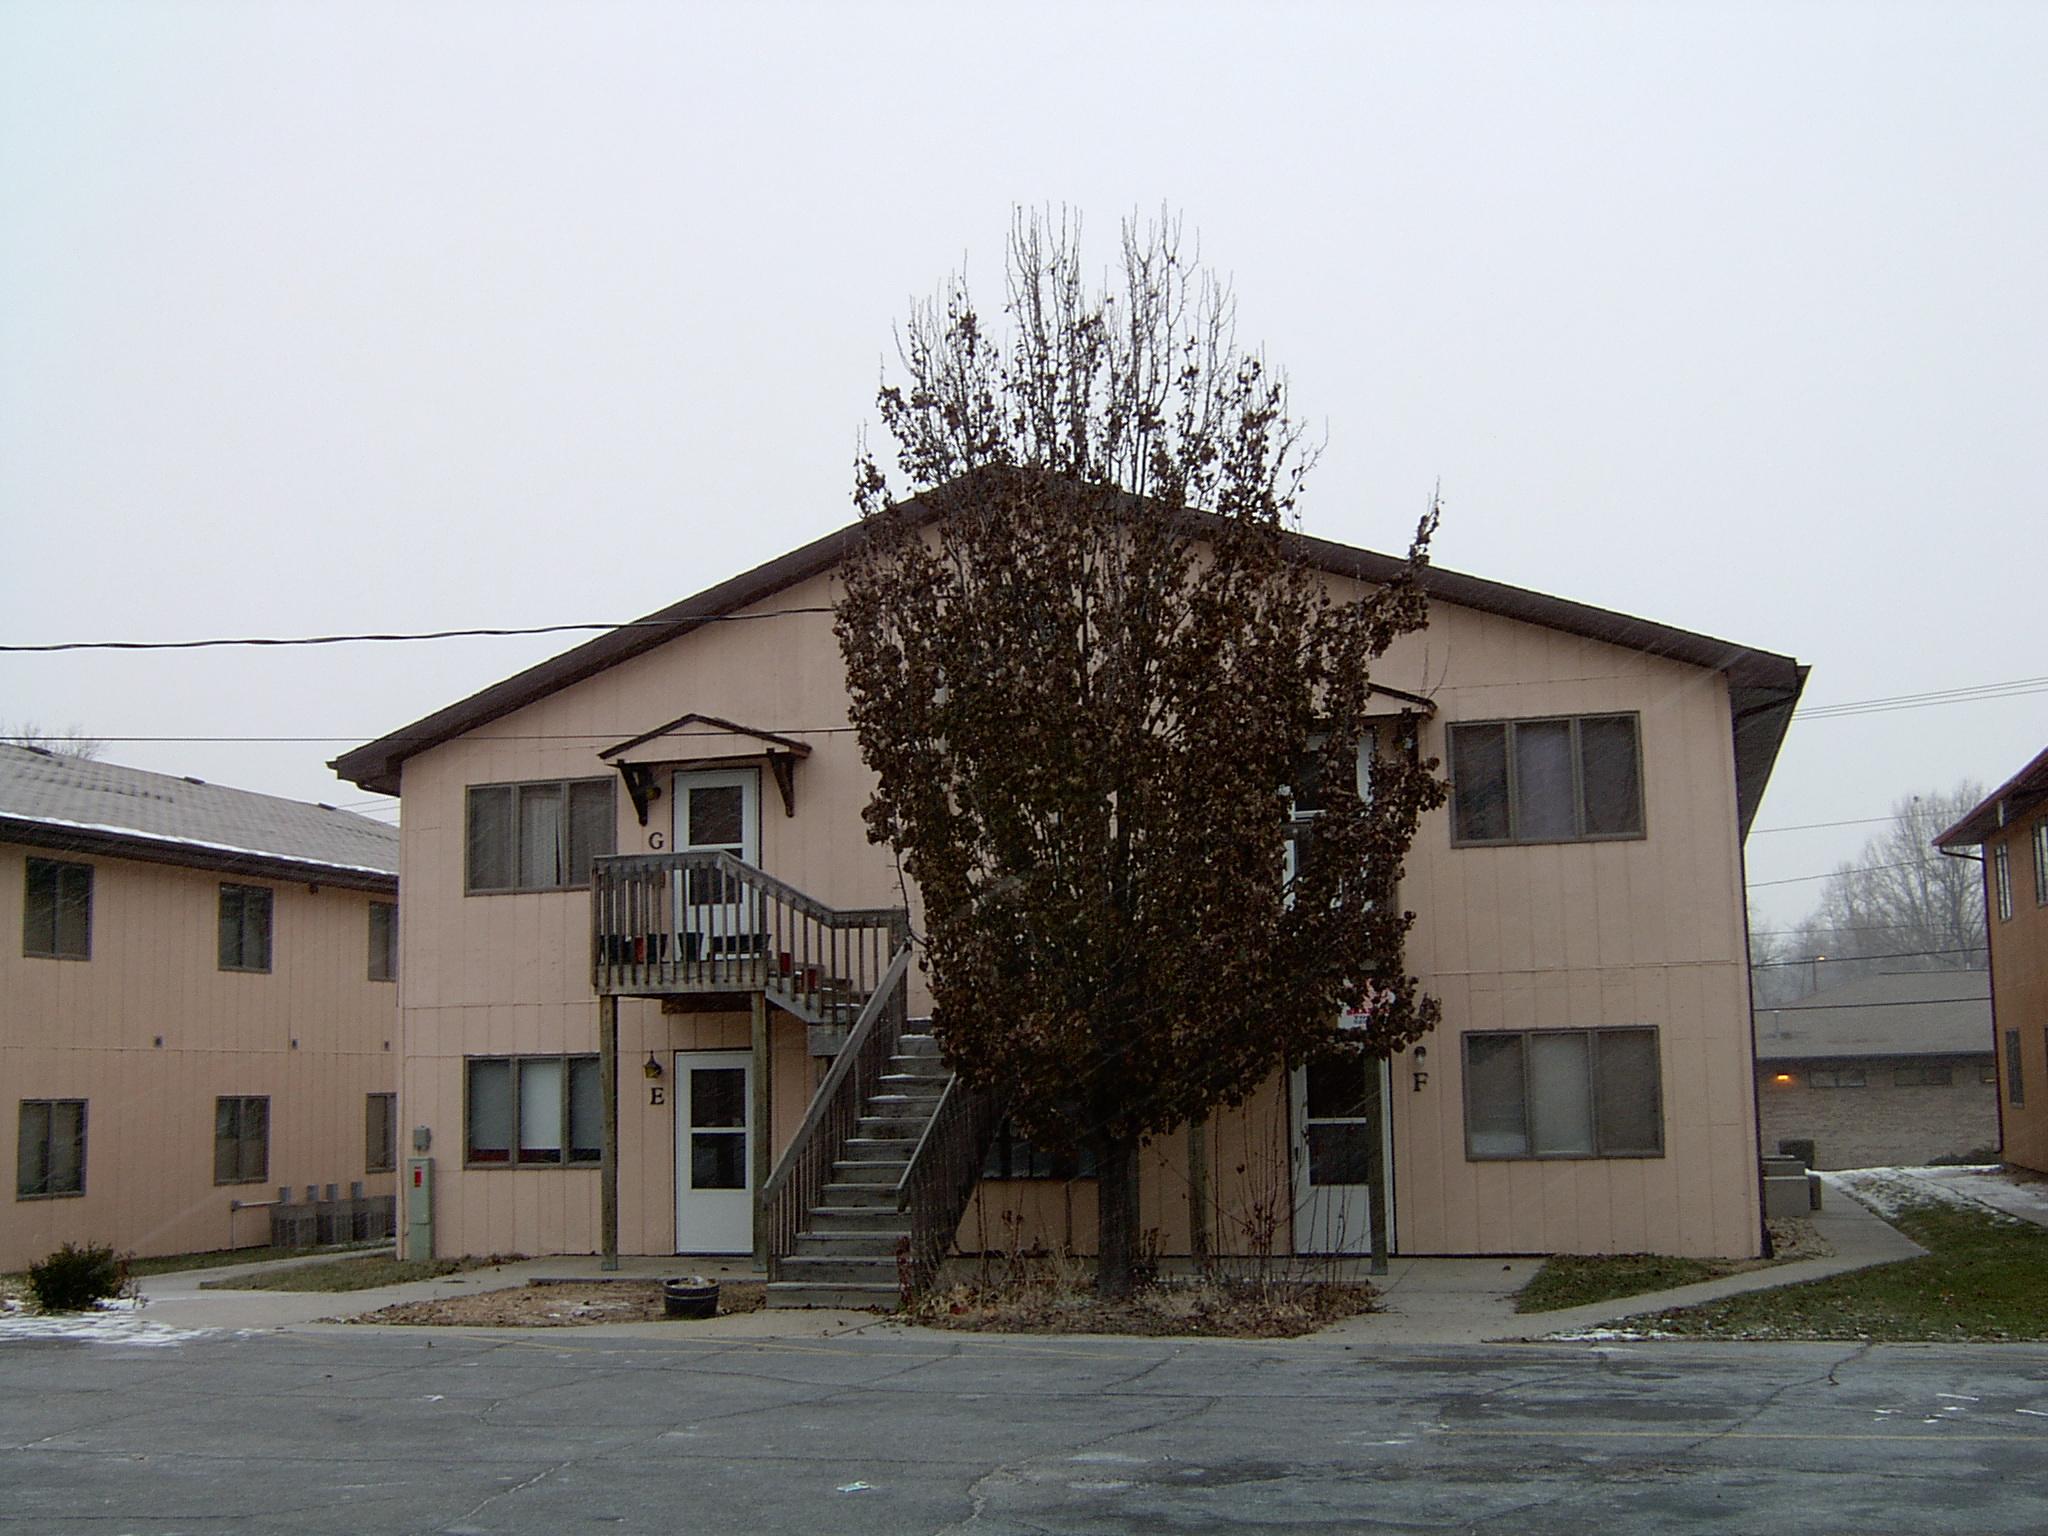 2005-1657-4P.JPG